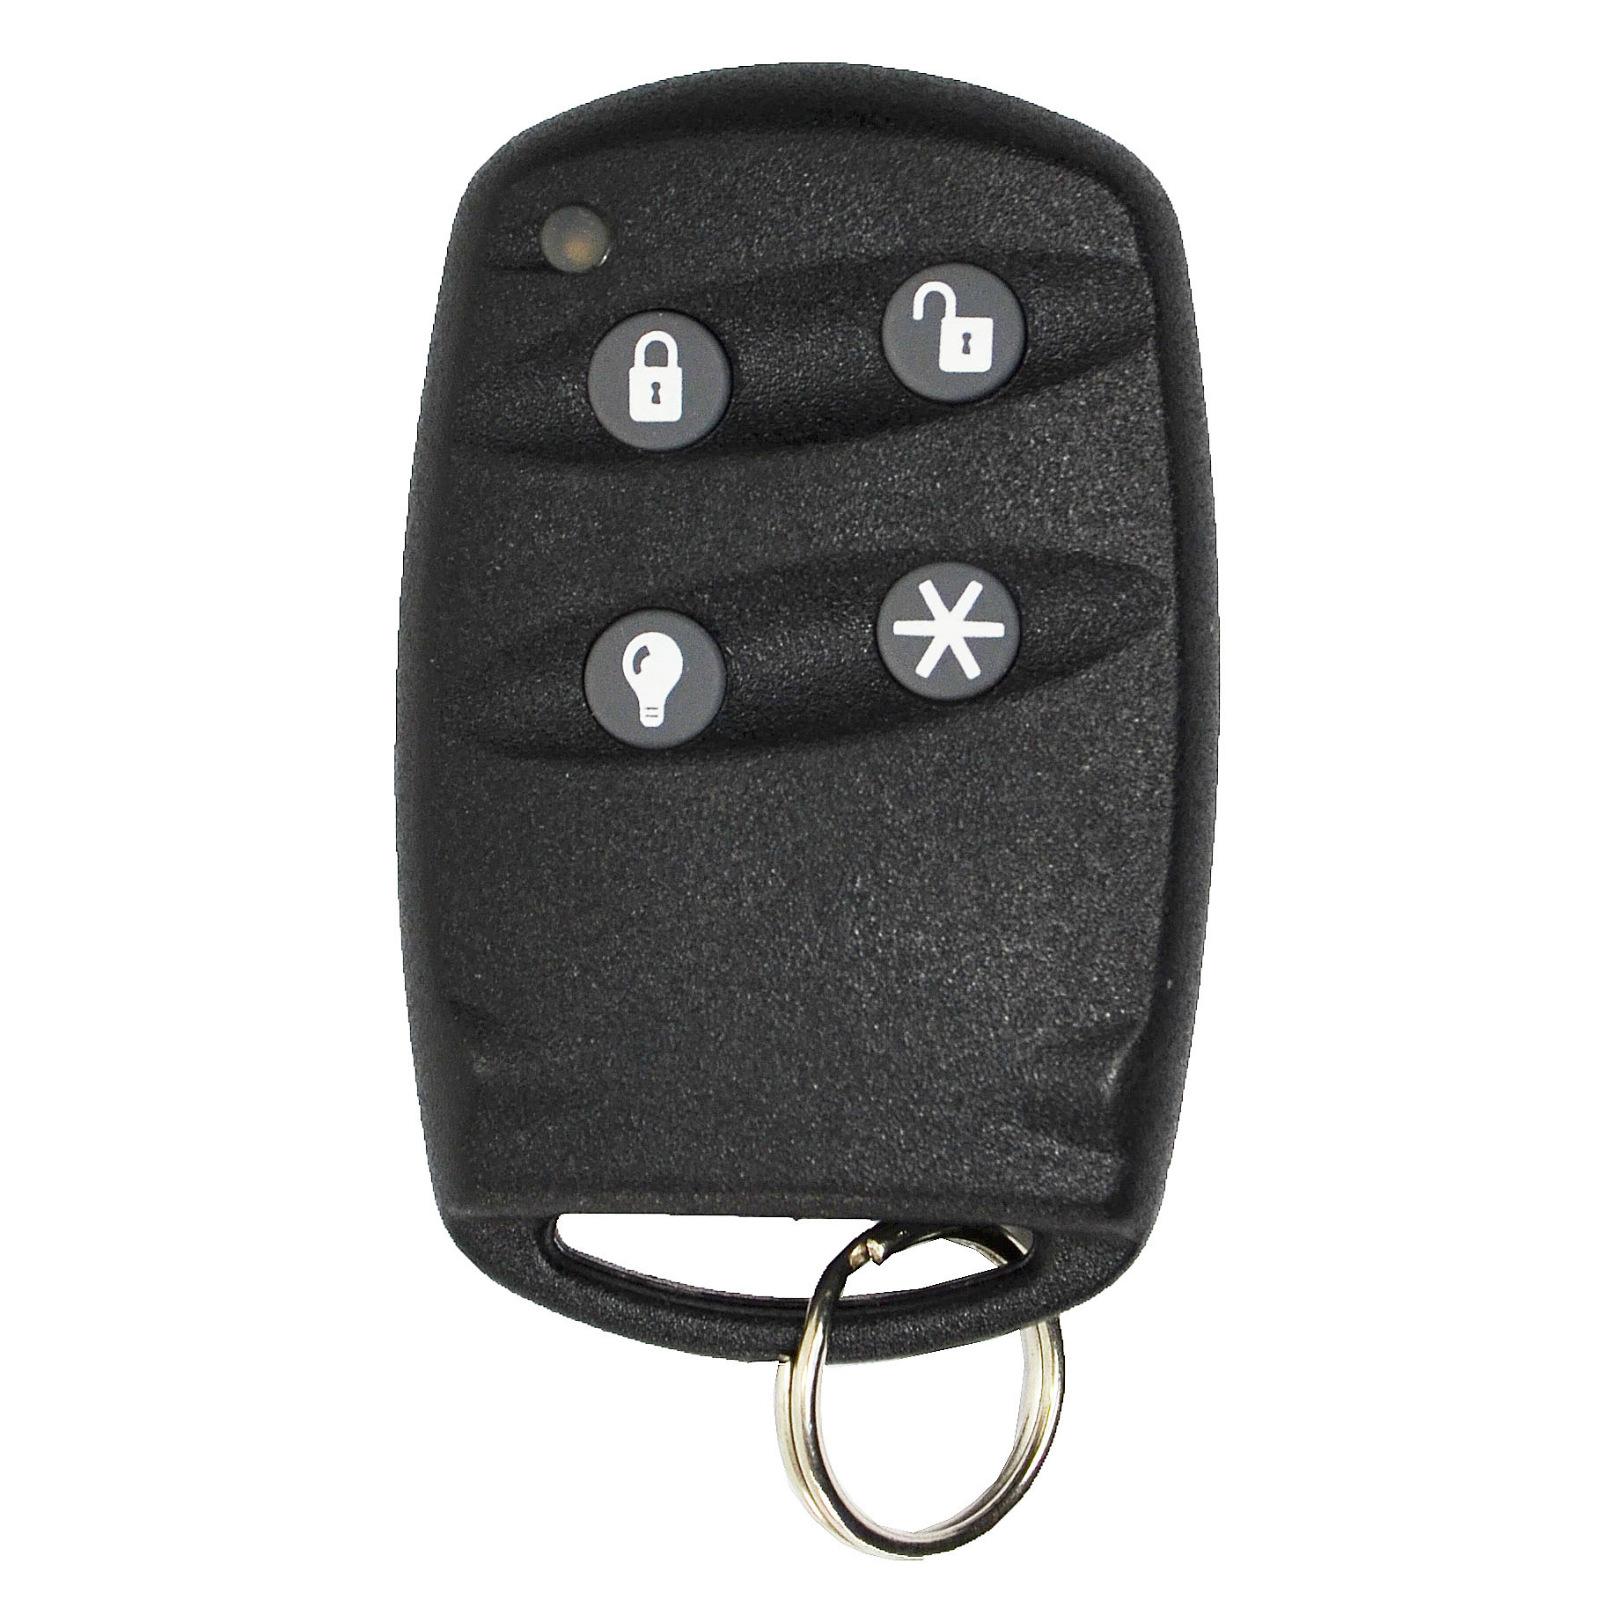 Used Elm Home Alarm Security System Remote B4z 760a Efob